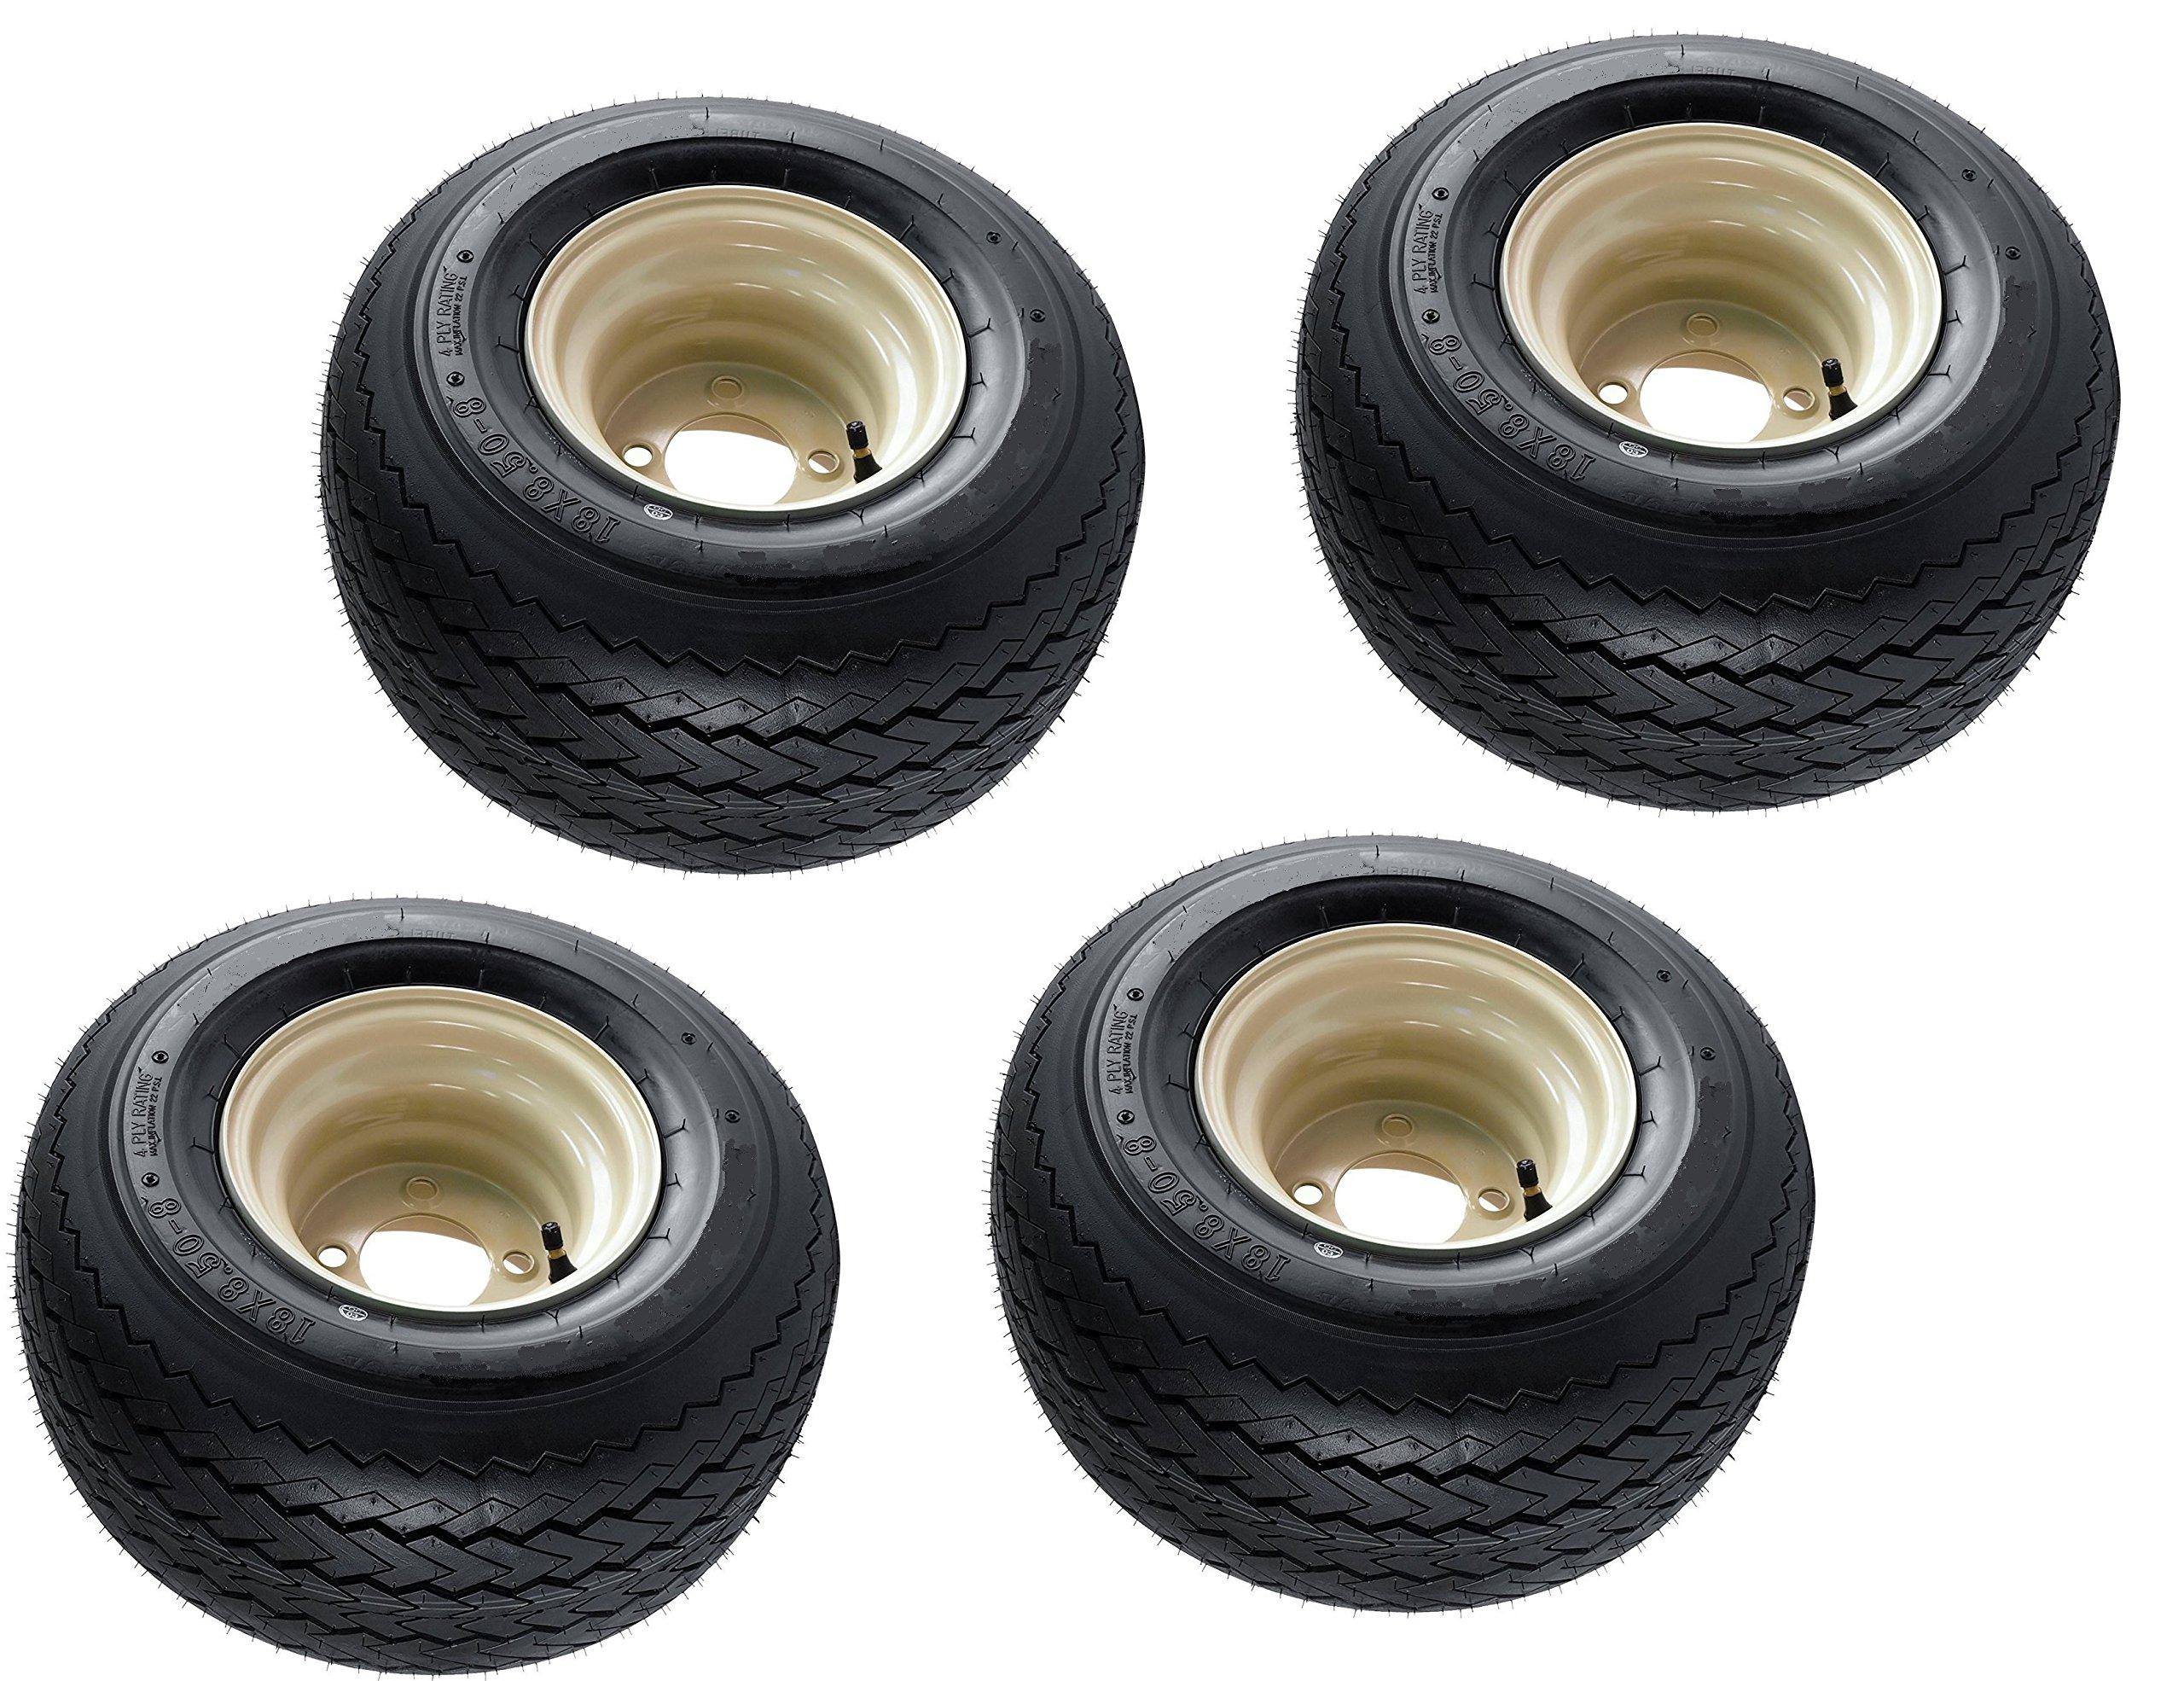 Slasher 18x8.50-8 GTX OEM Golf Cart Wheels and Golf Cart Tires Combo - Set of 4 (18x8.5-8, Beige)